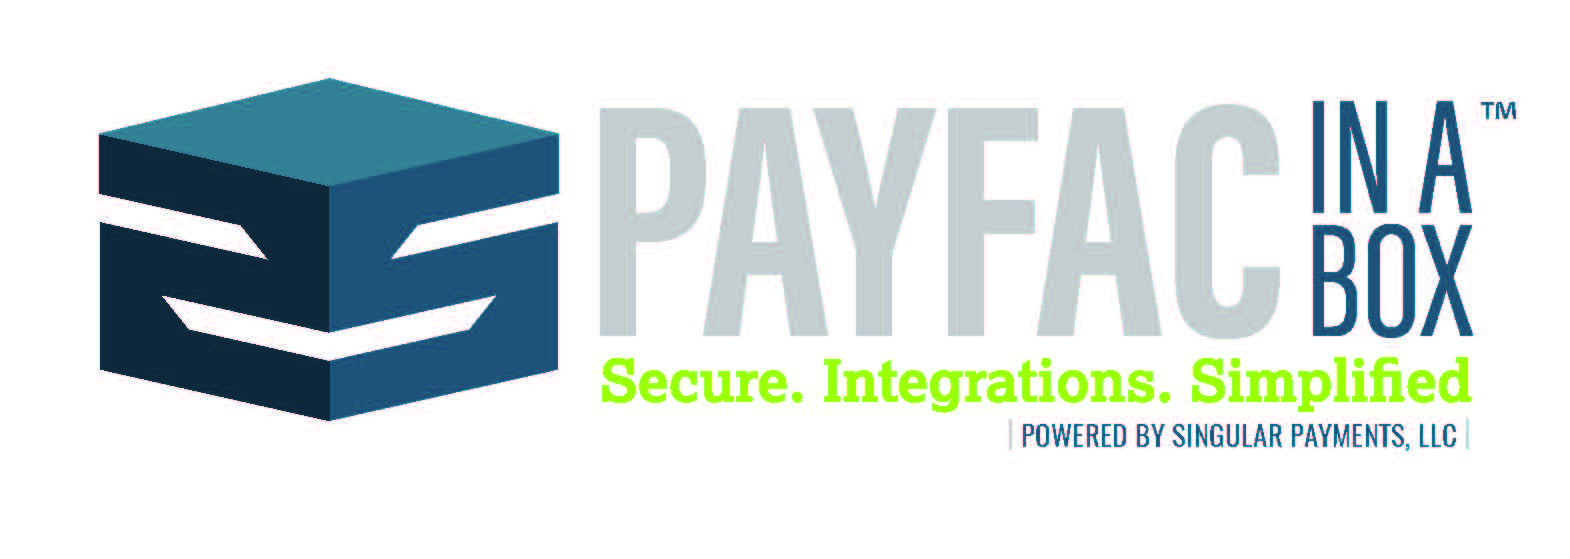 PayfacinaBoc_logo_FINAL_TM.jpg